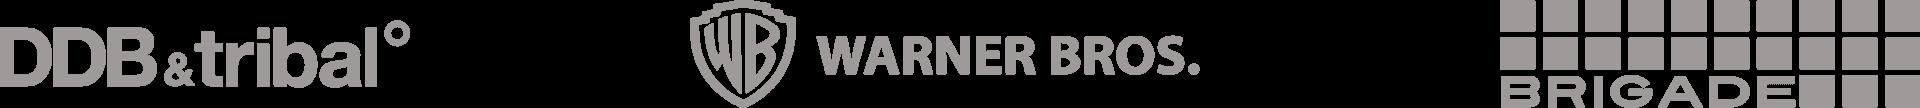 Clients - Neonet Rauxa TheNets Tesco